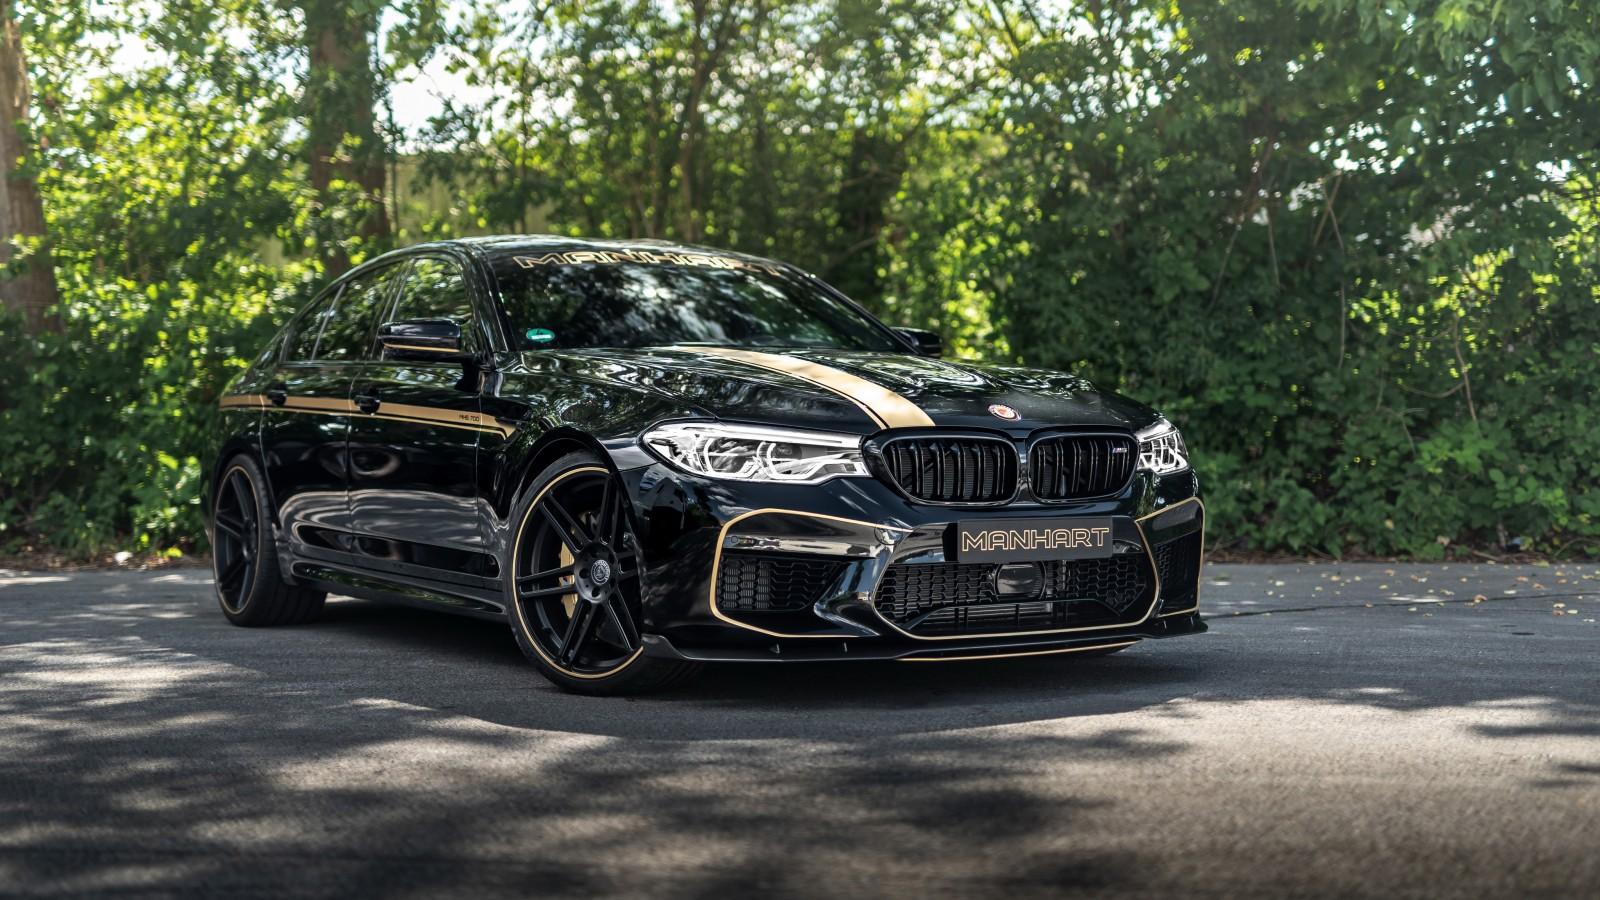 BMW M5 Manhart Racing MH5 700 2018 4K Wallpaper   HD Car ...